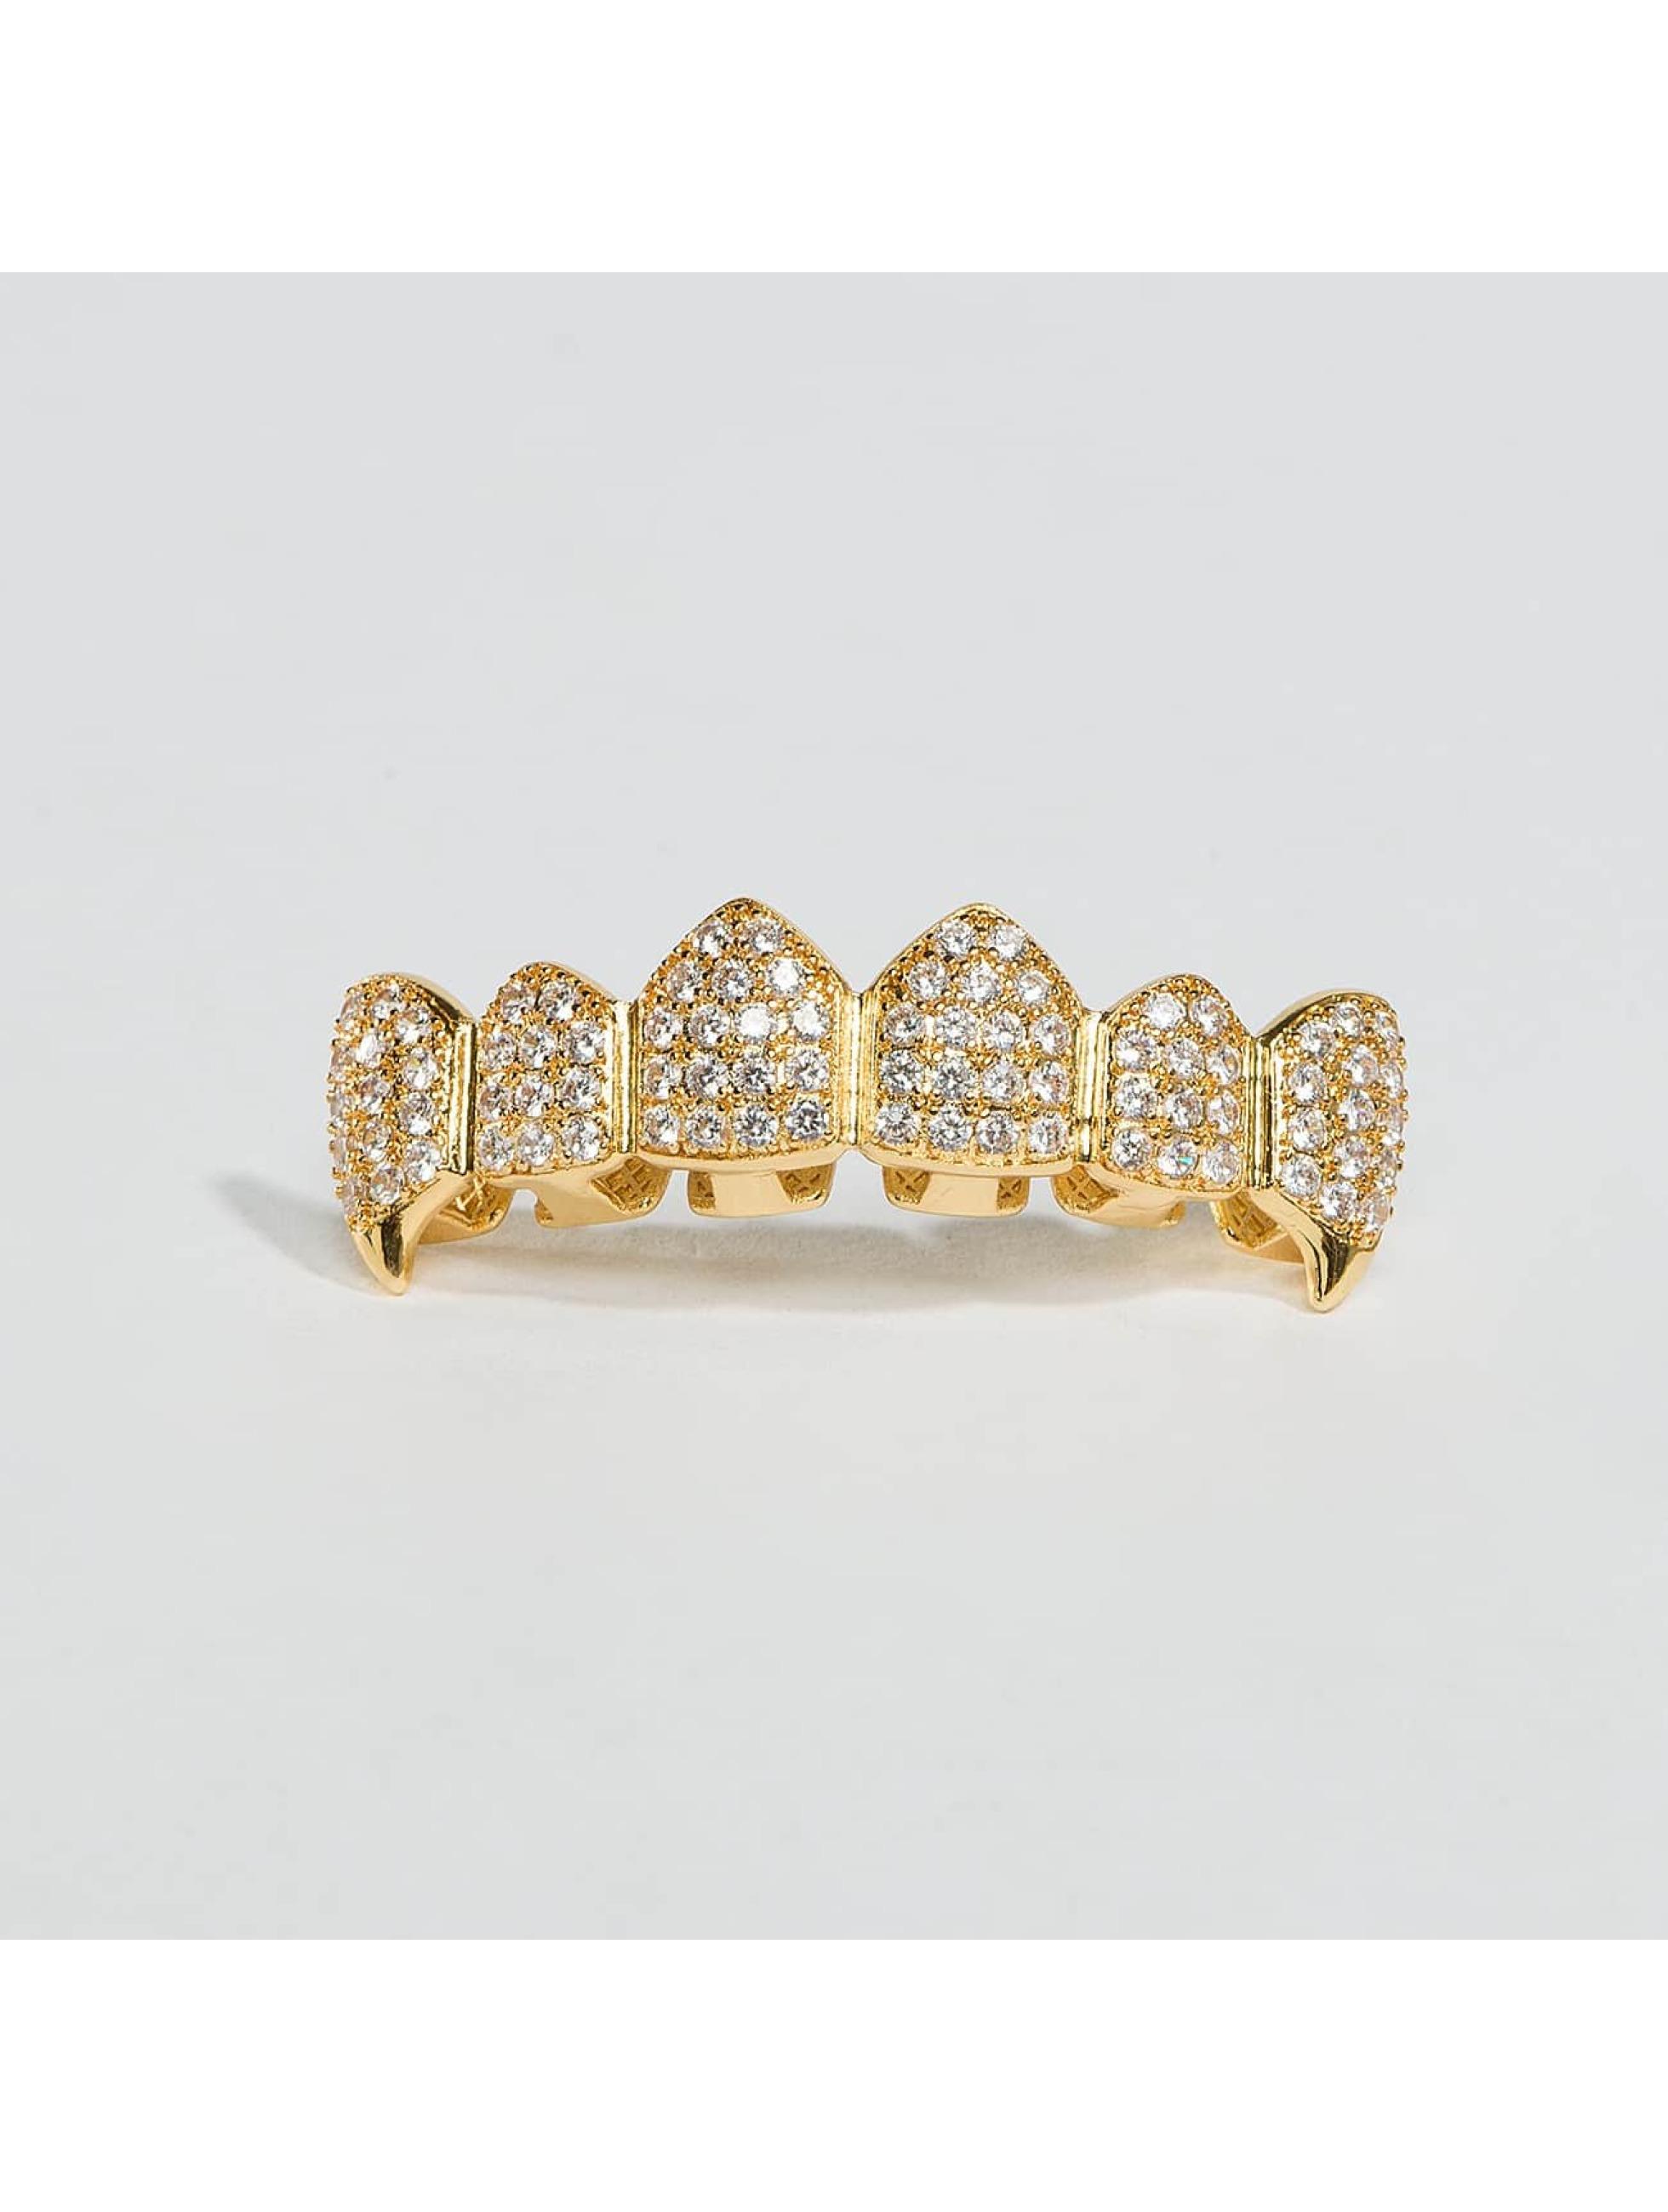 KING ICE Sonstige Gold_Plated CZ Dracula Teeth Top goldfarben